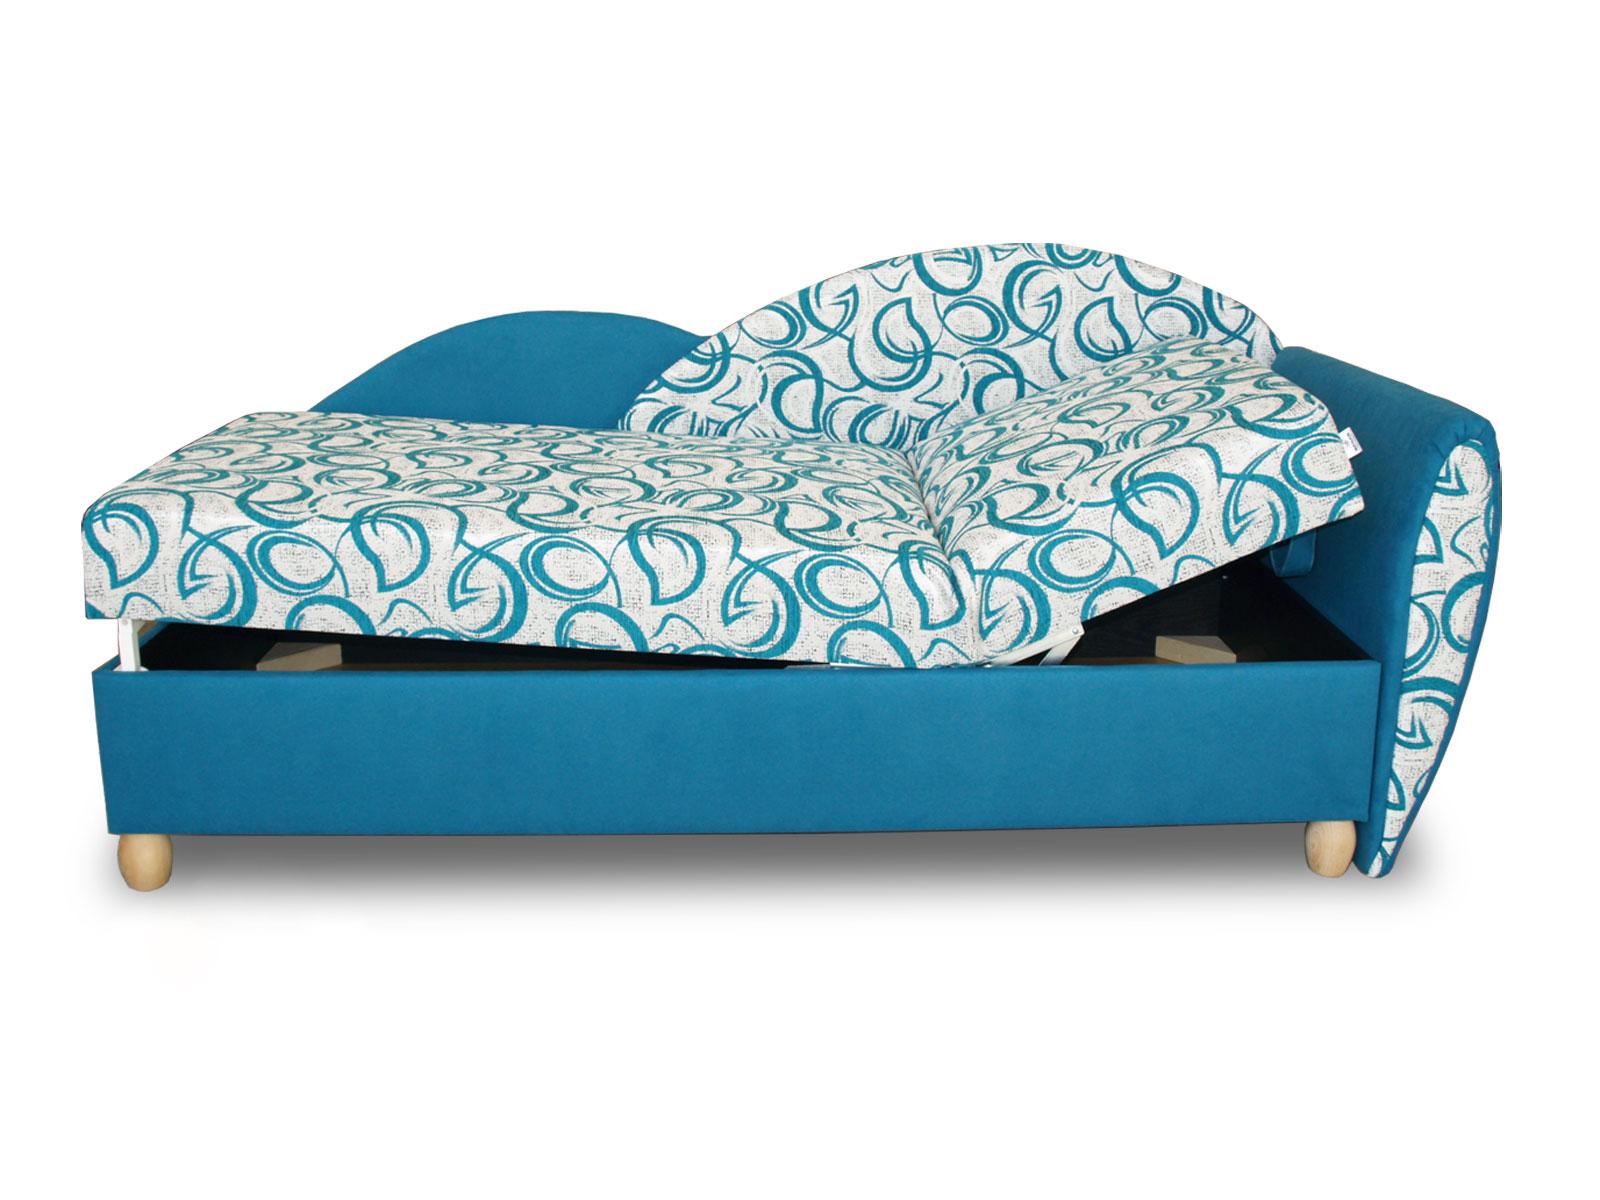 Jednolůžková postel (válenda) 80 cm - Benab - Relax plus (s rošty a matracemi)